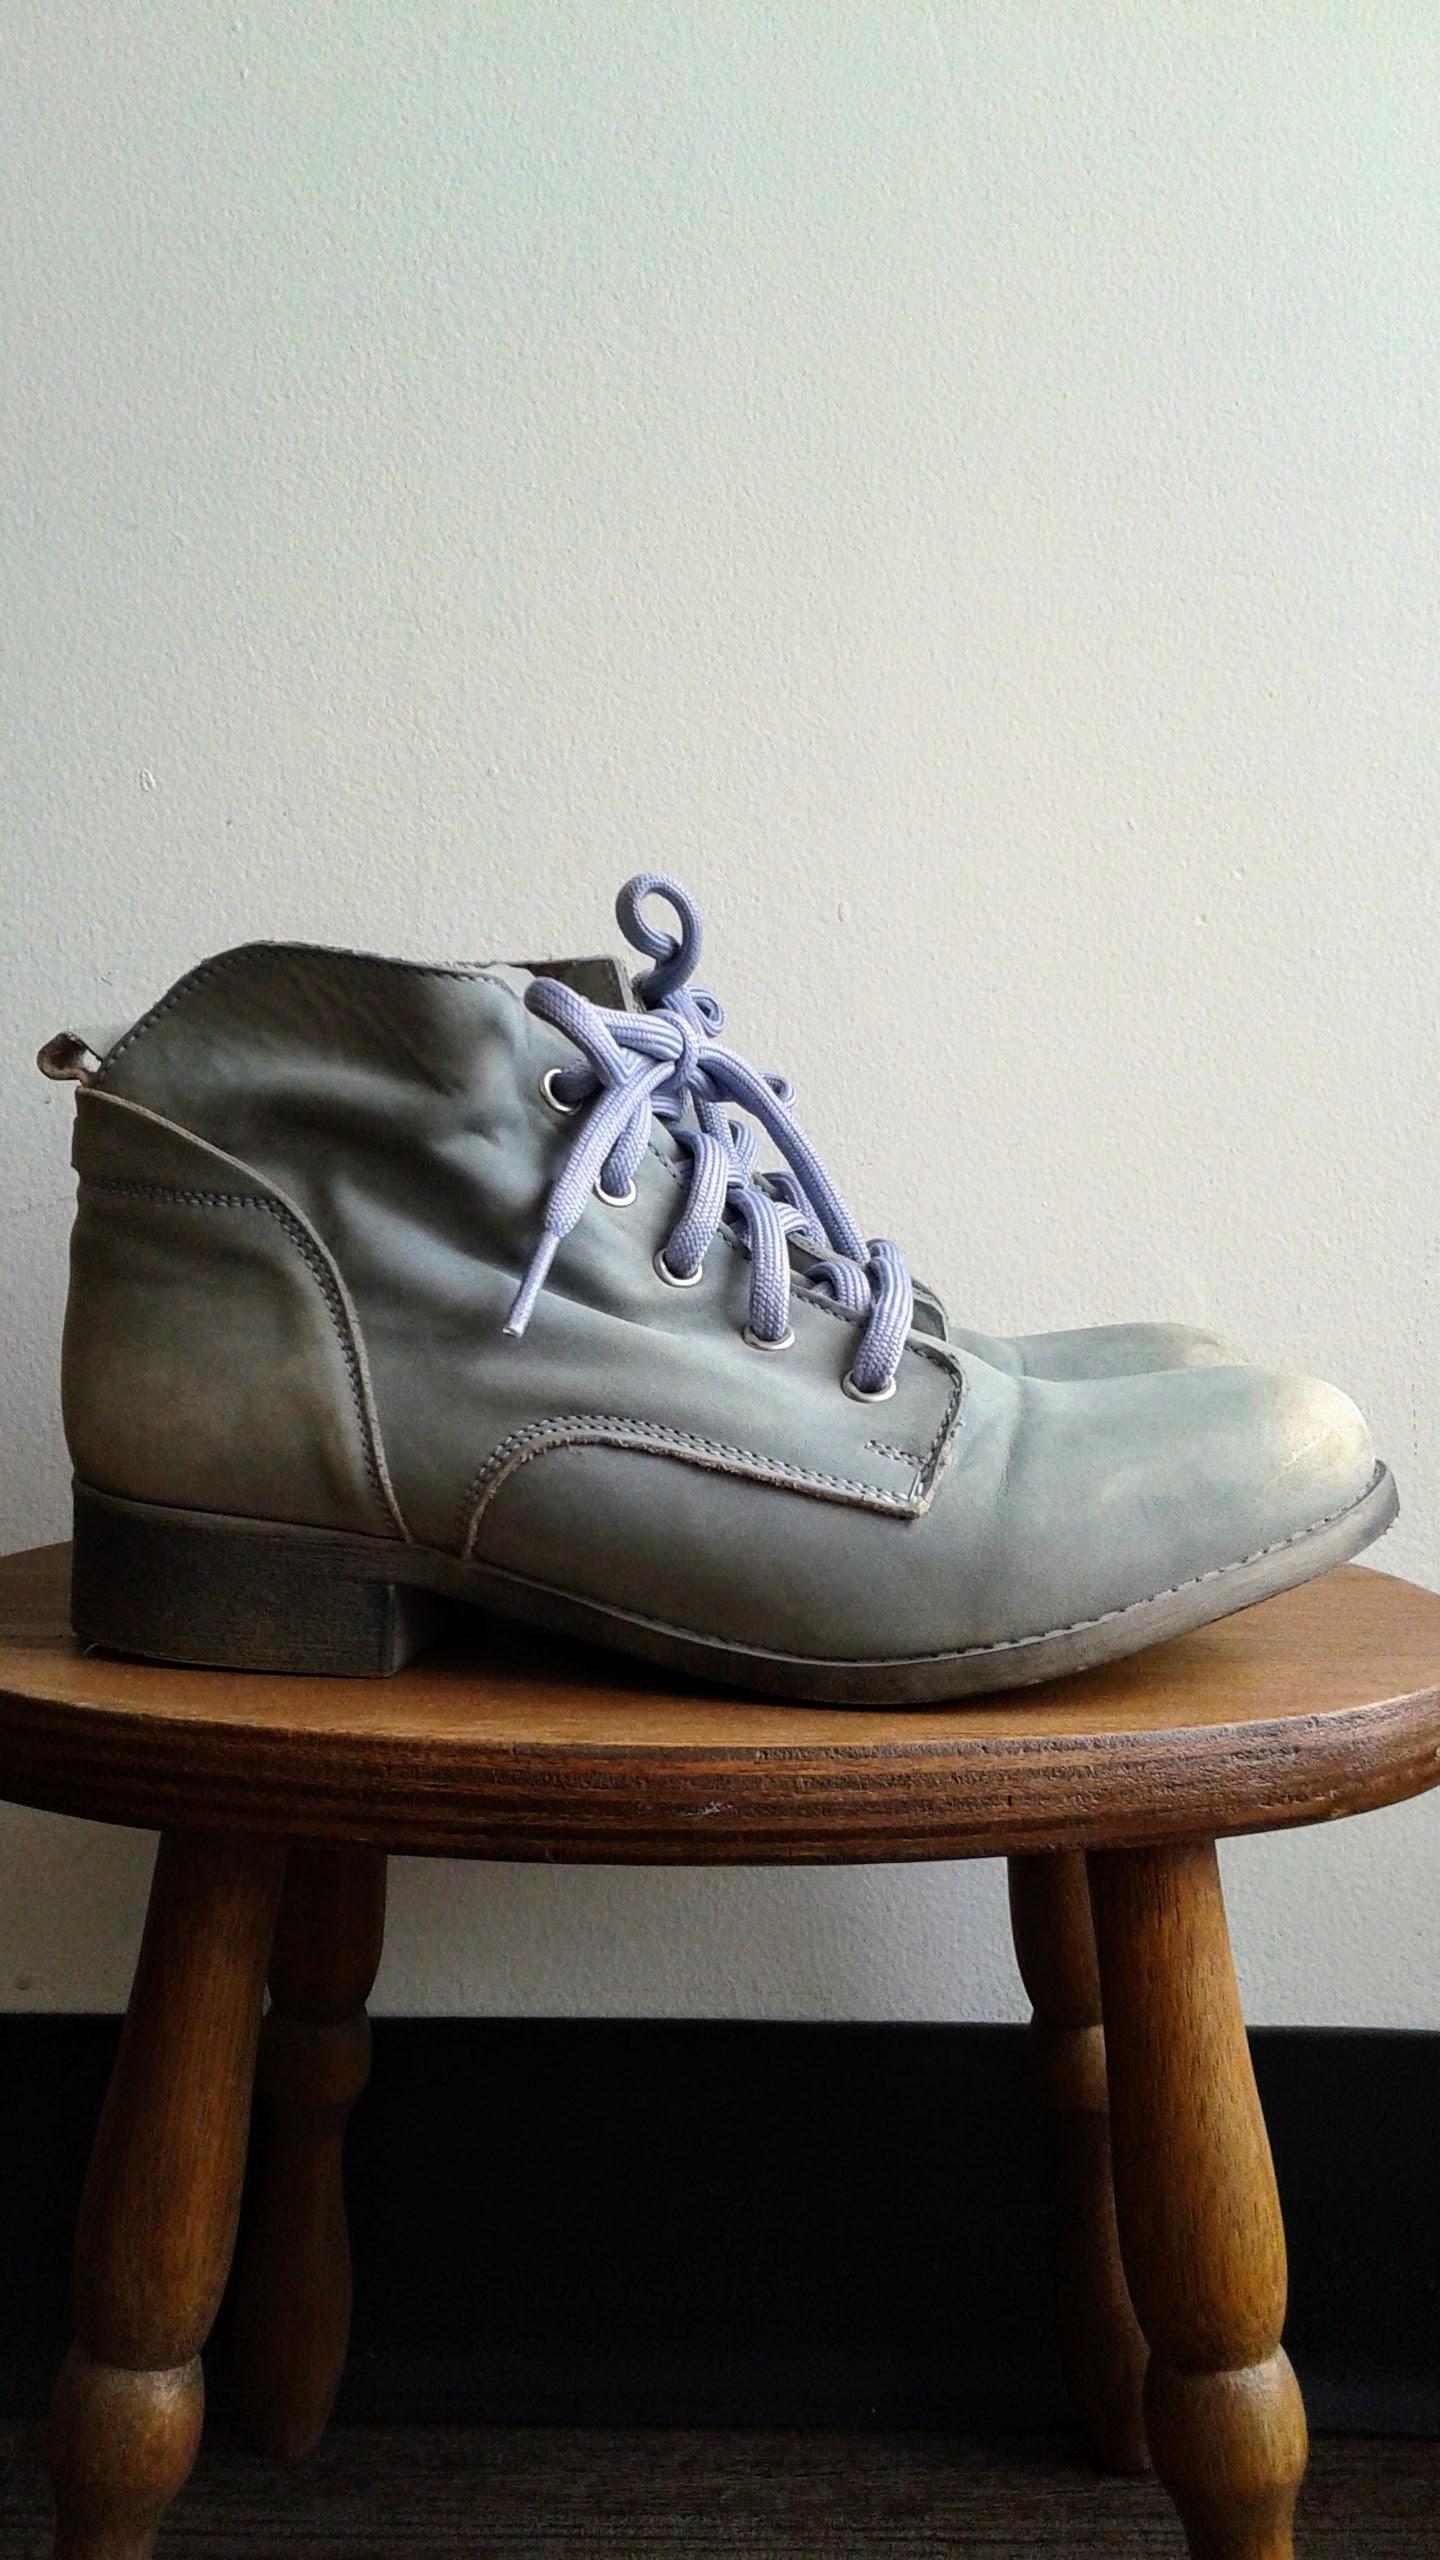 Steve Madden boots; S7.5, $40